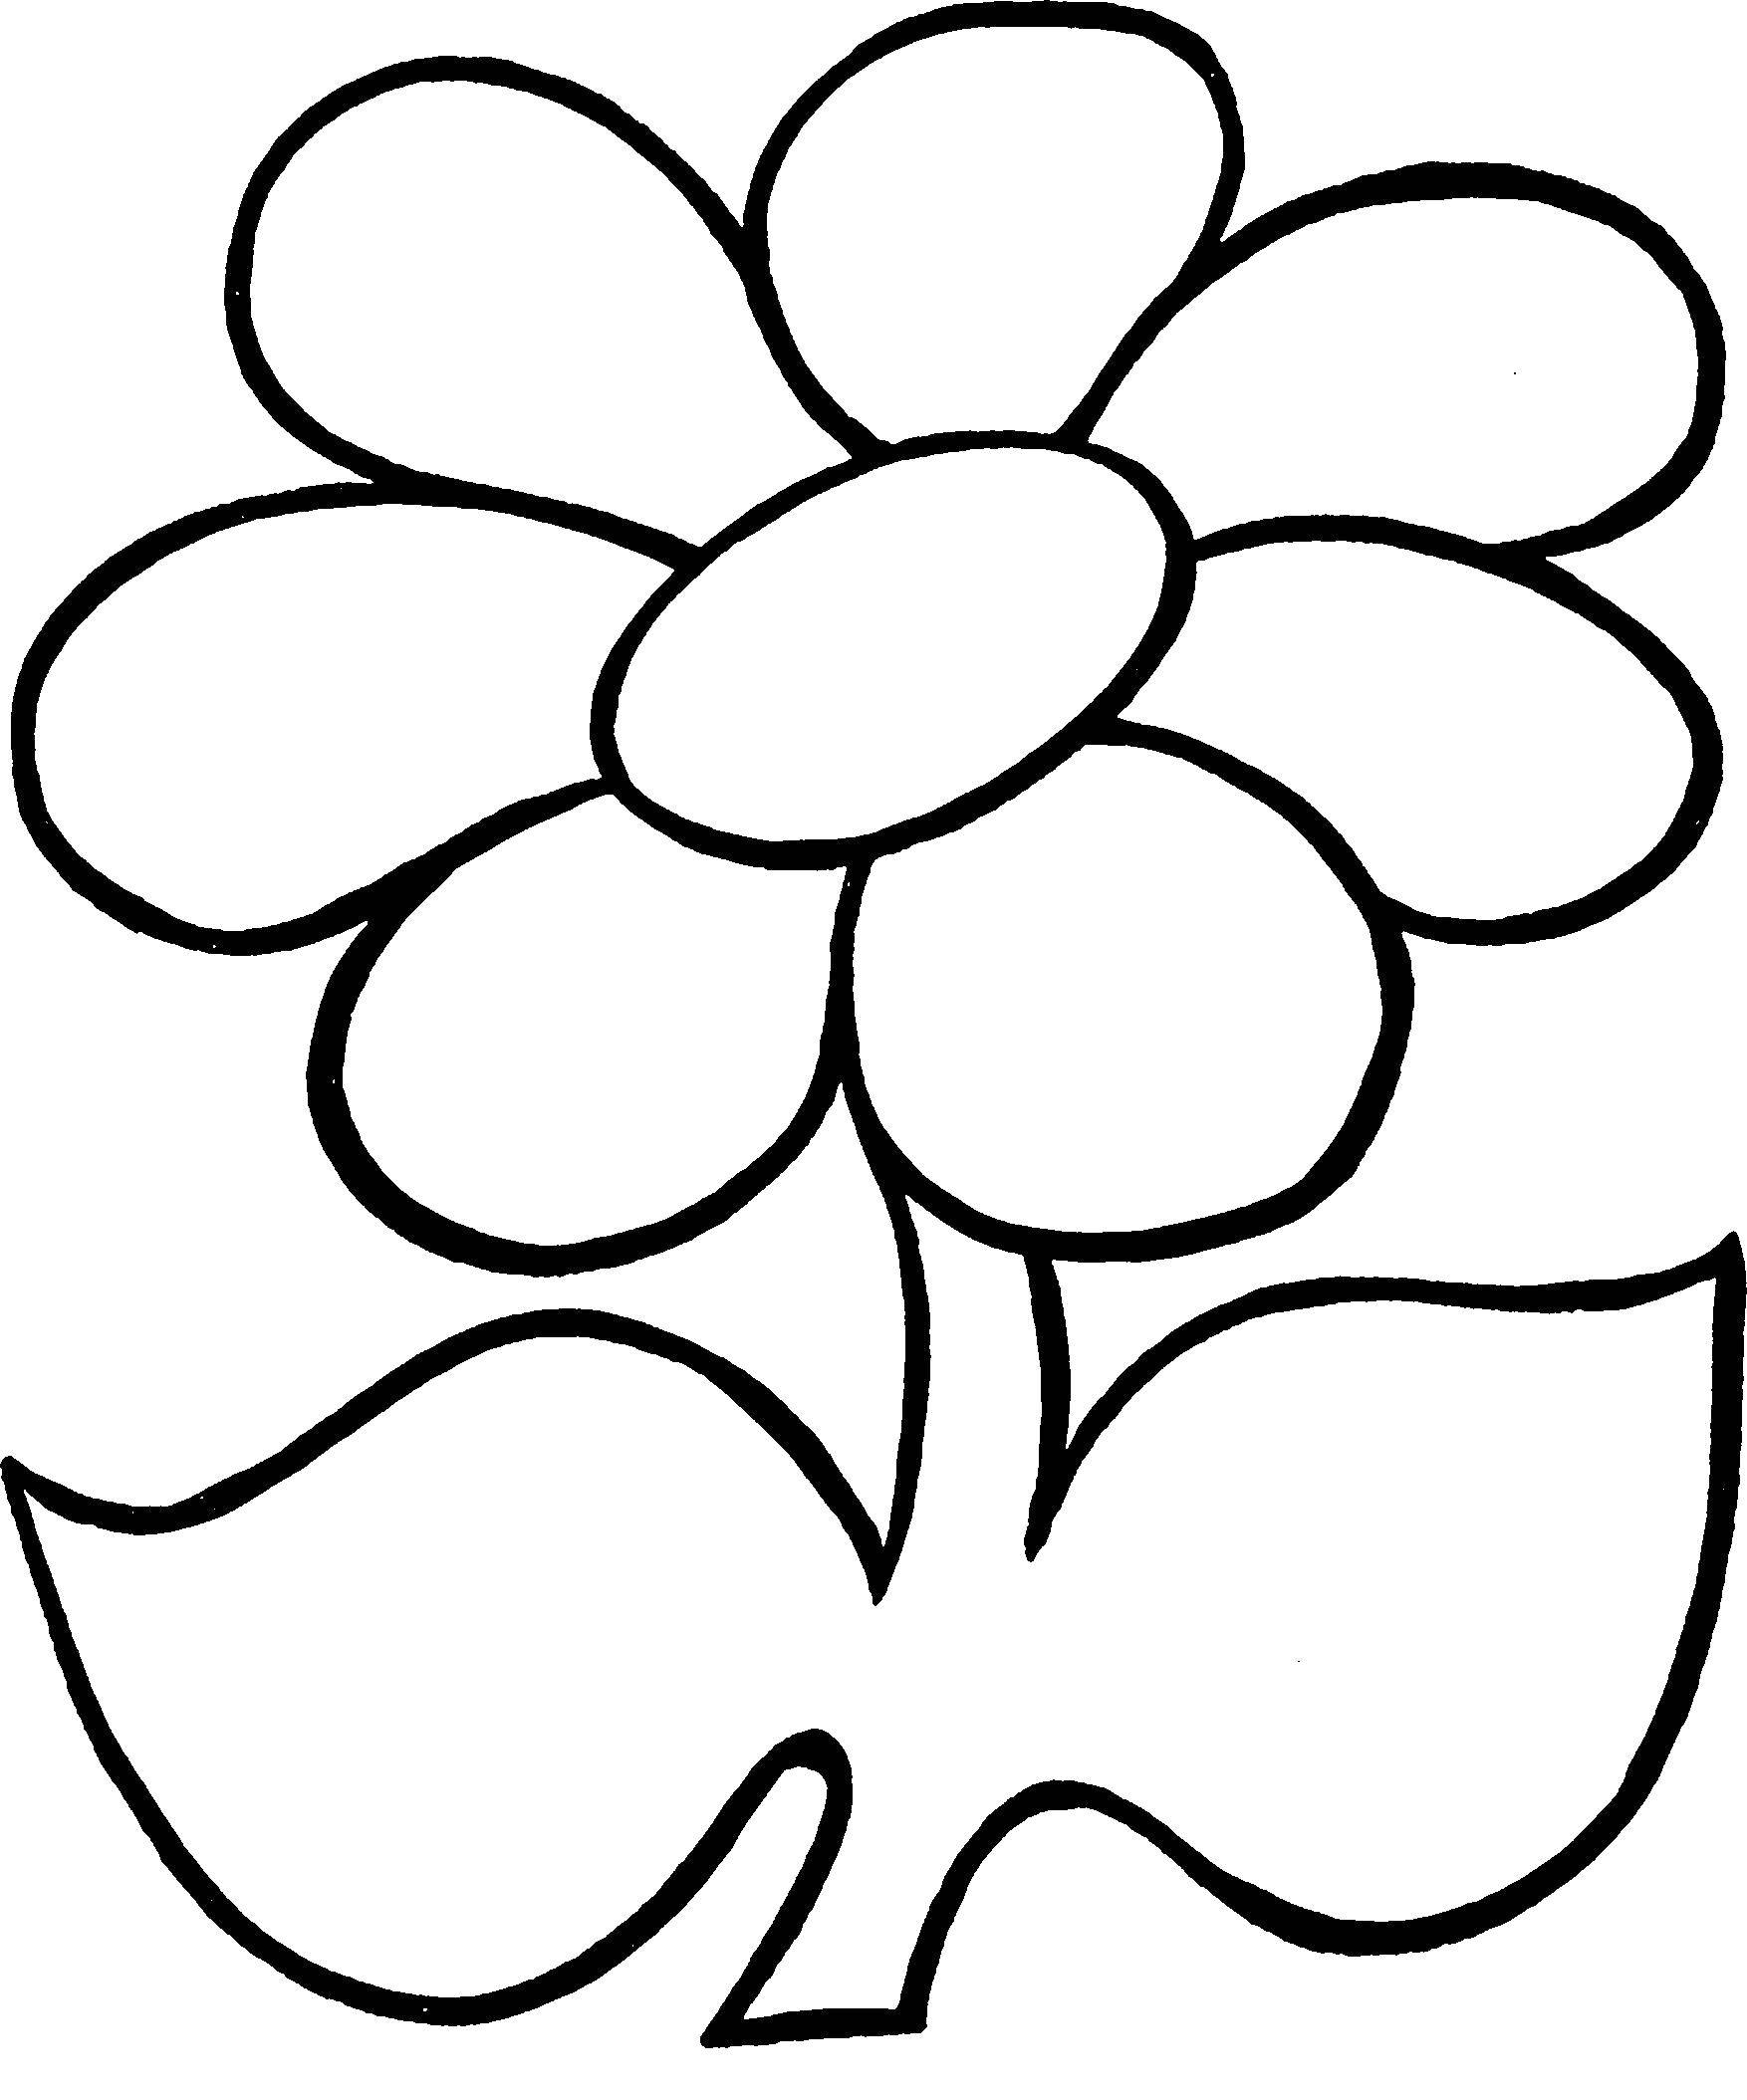 Coloring sheet flowers Download fruit, banana.  Print ,banana,